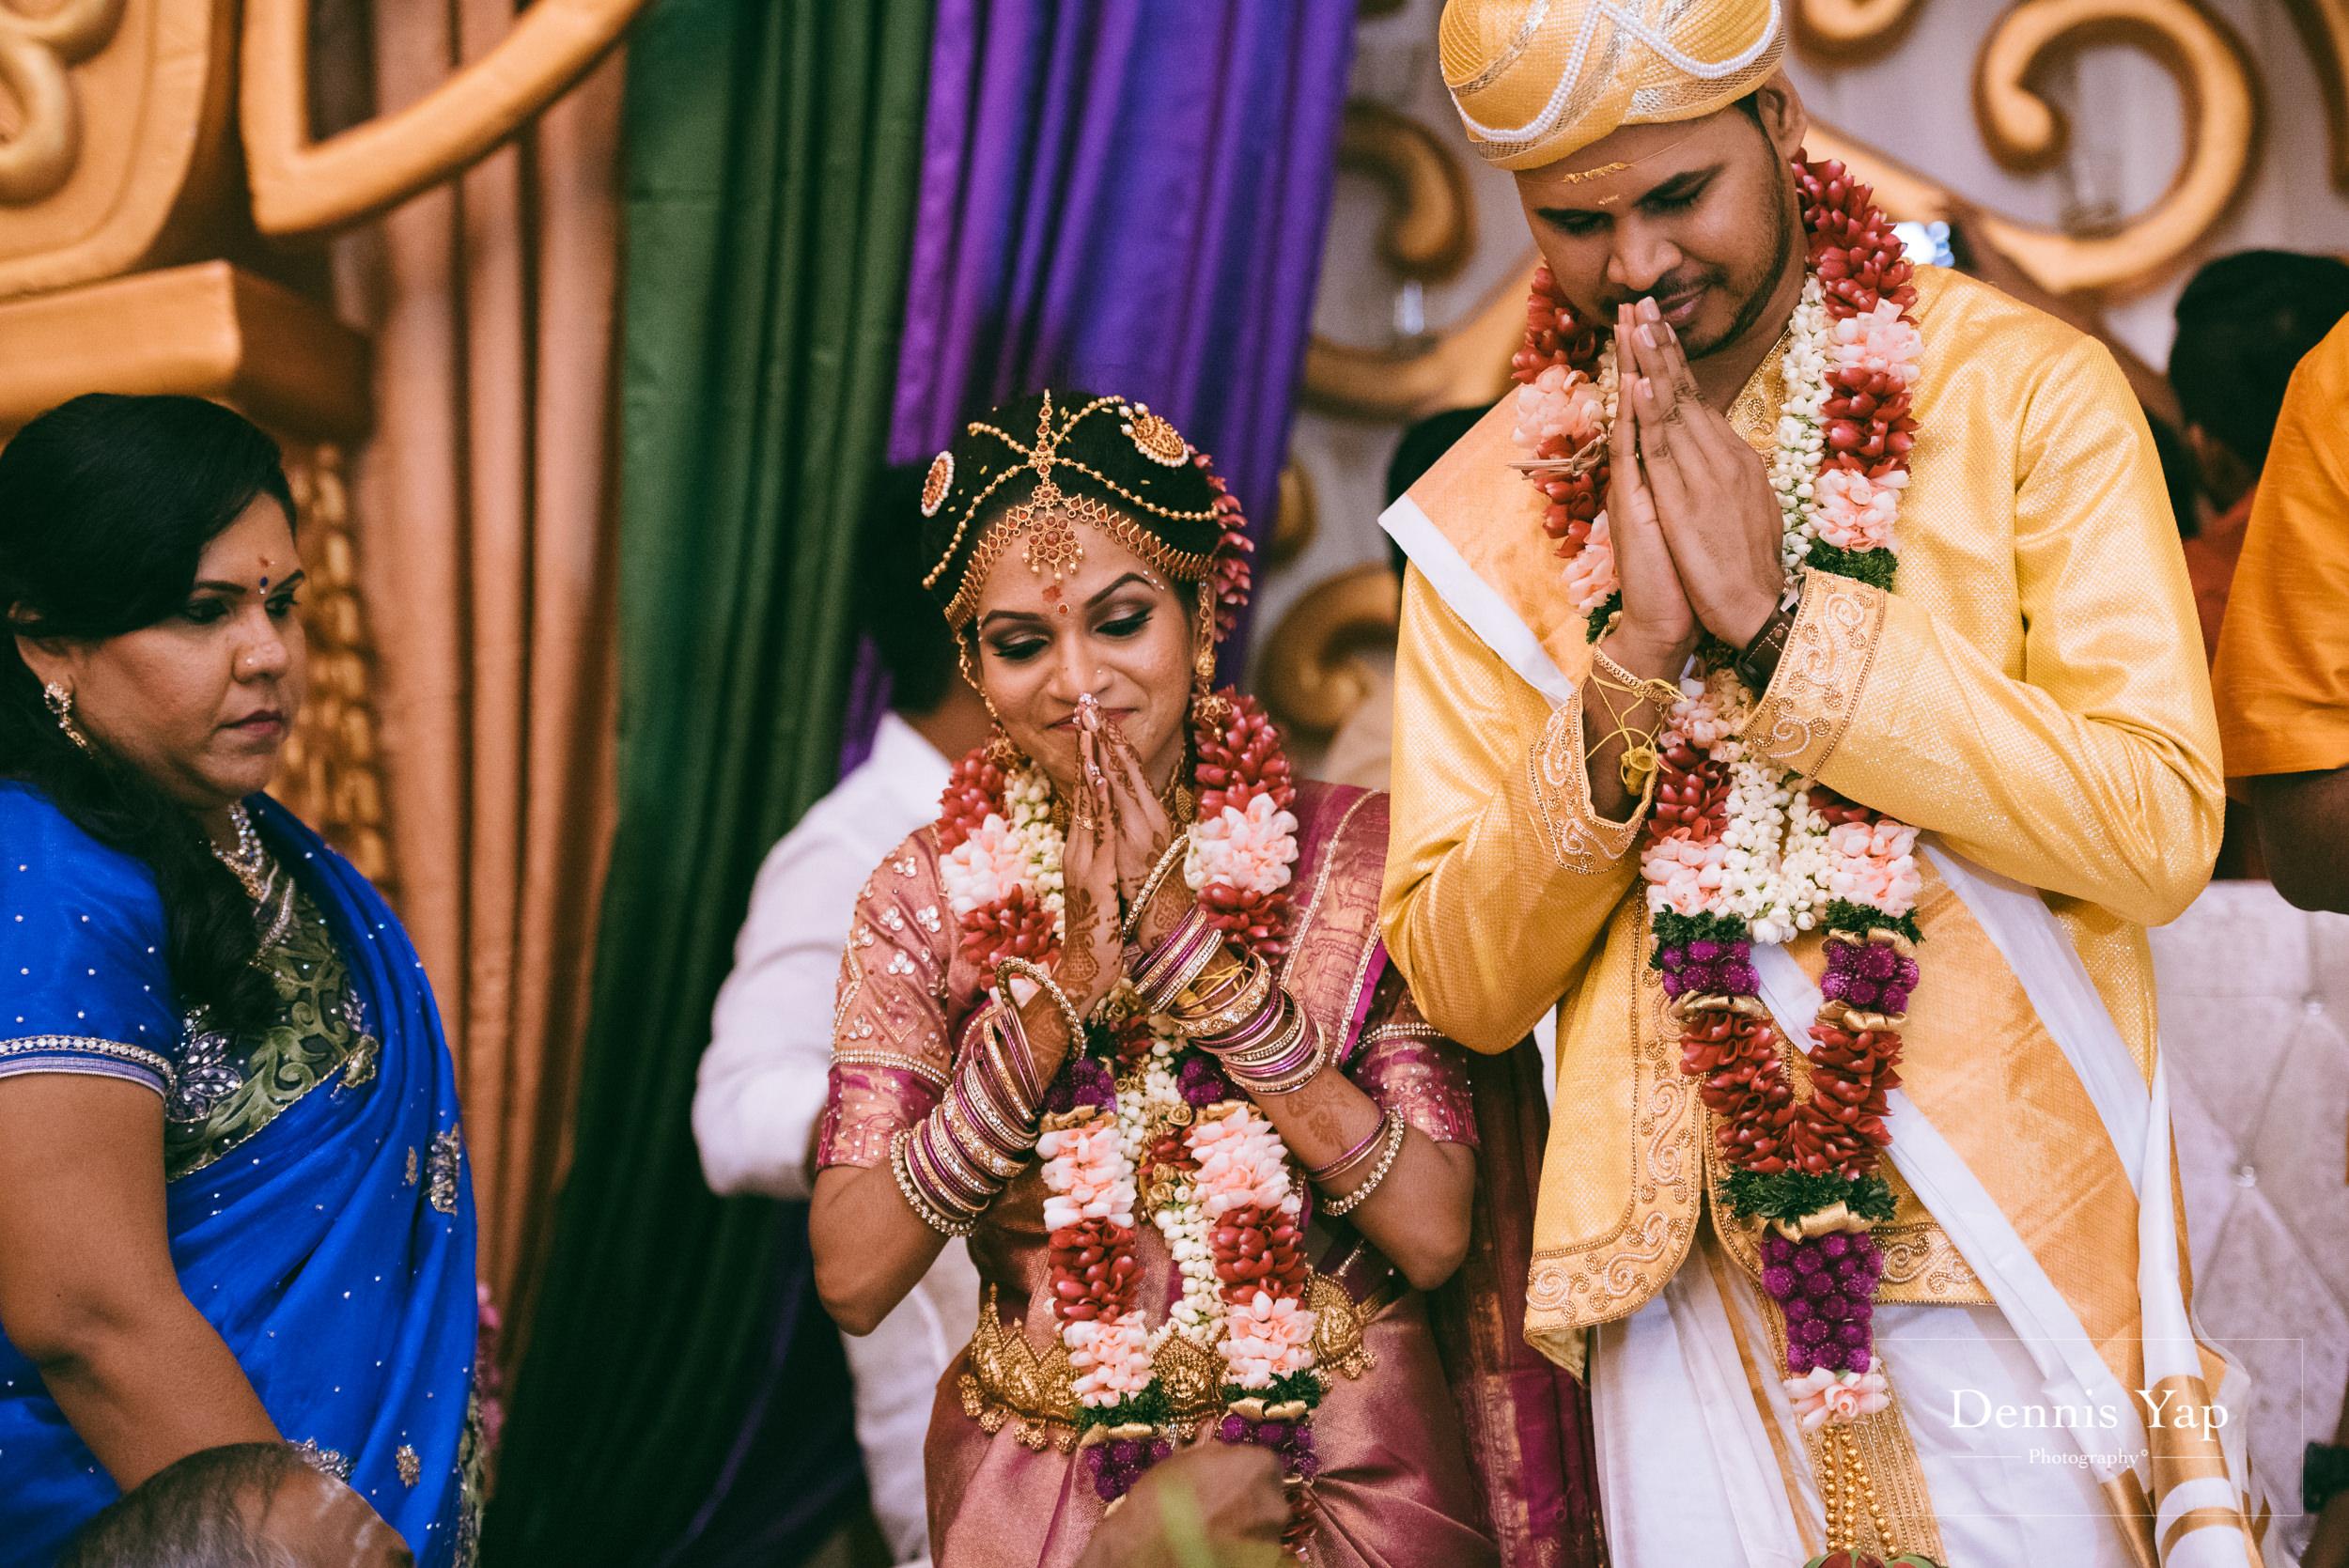 puvaneswaran cangitaa indian wedding ceremony ideal convention dennis yap photography malaysia-28.jpg